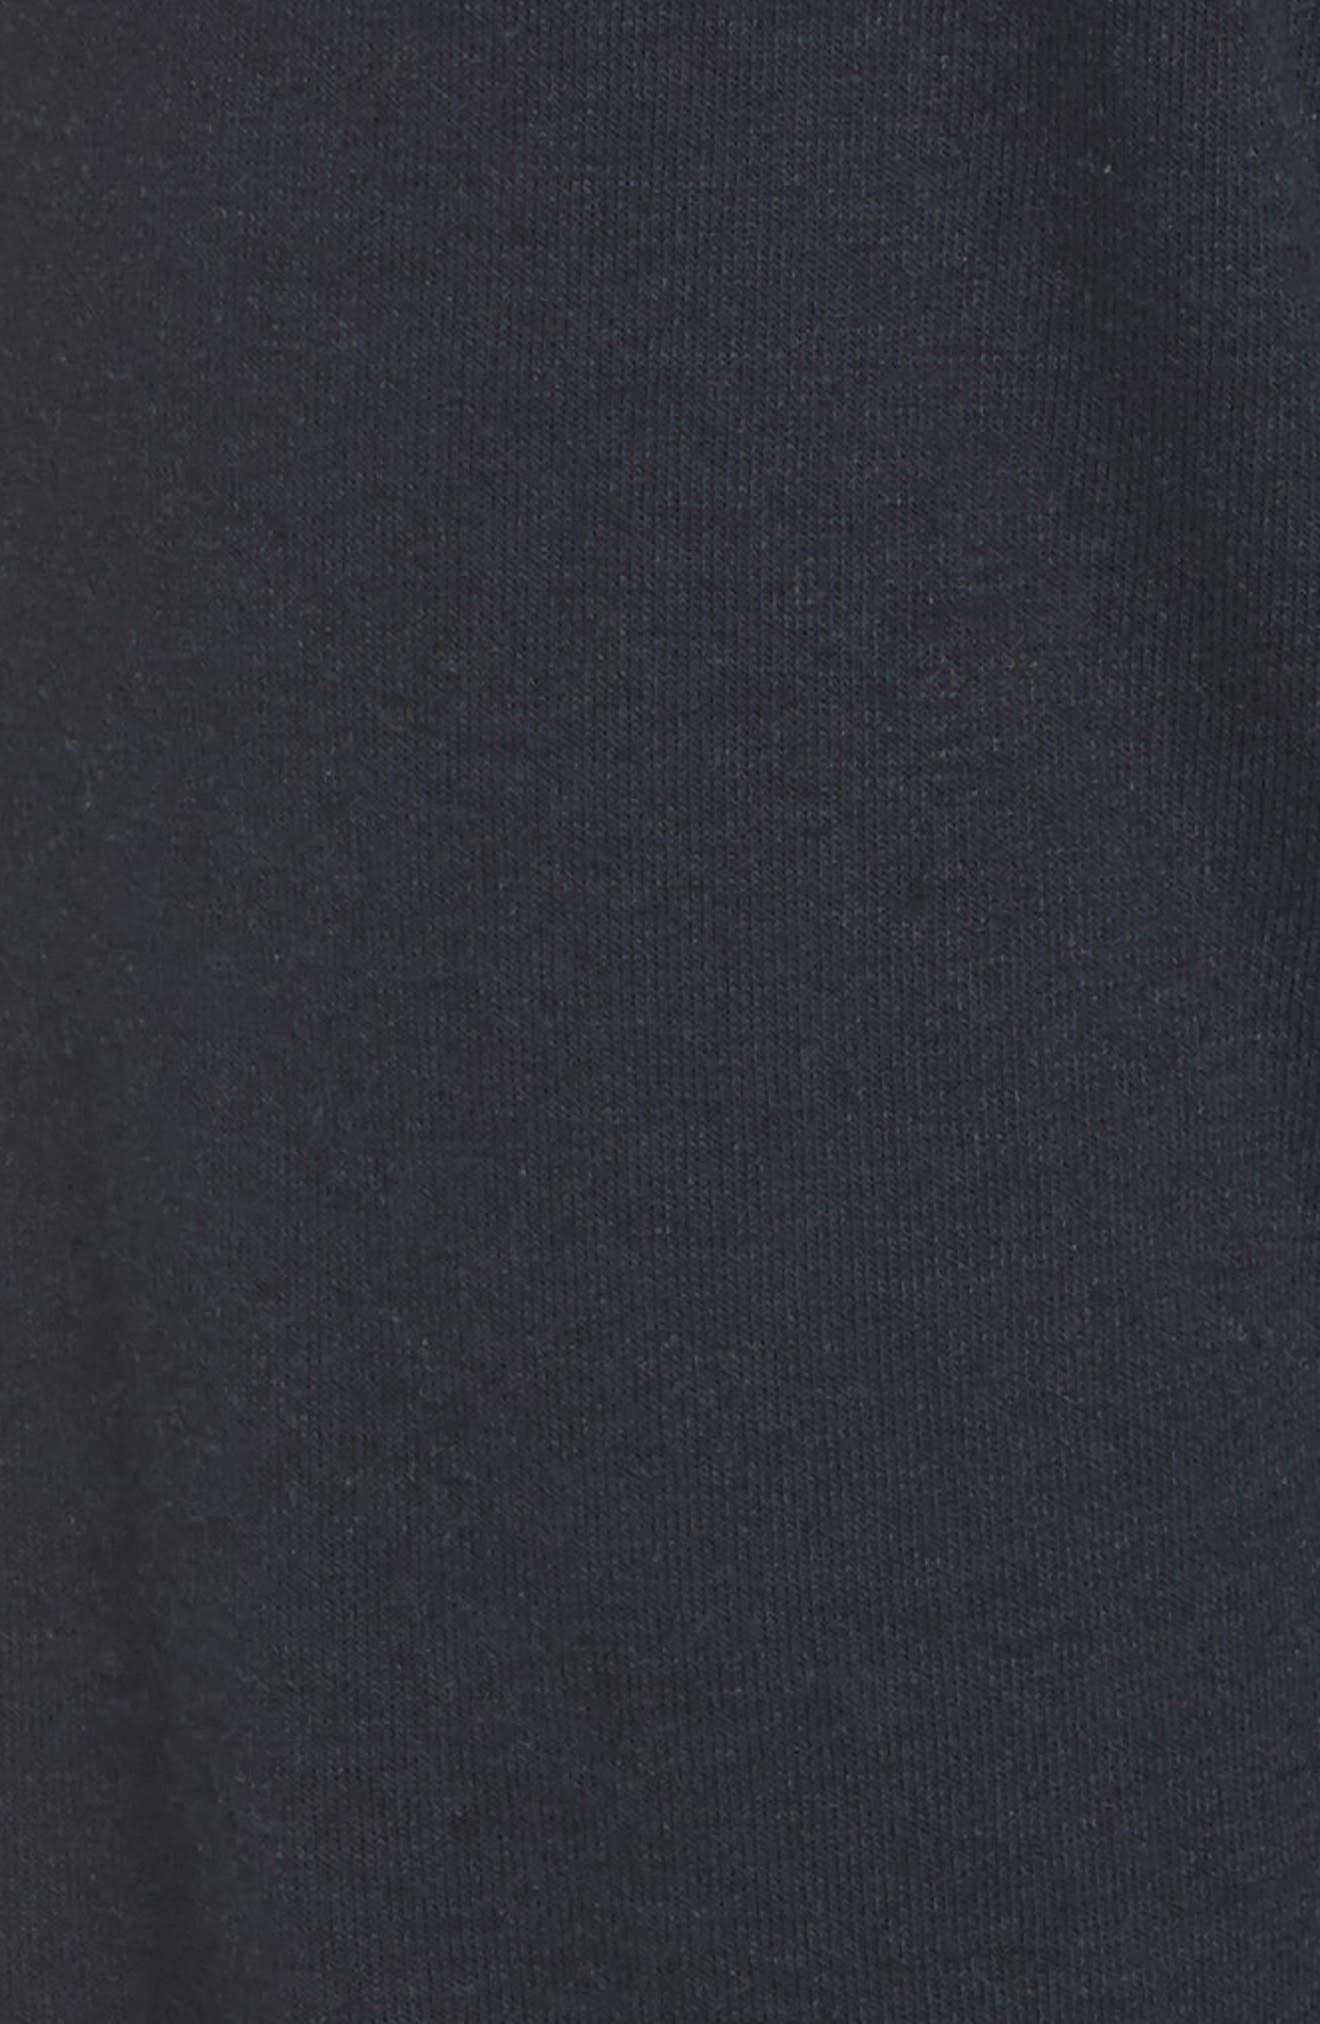 Bolt Sweatpants,                             Alternate thumbnail 6, color,                             Charcoal